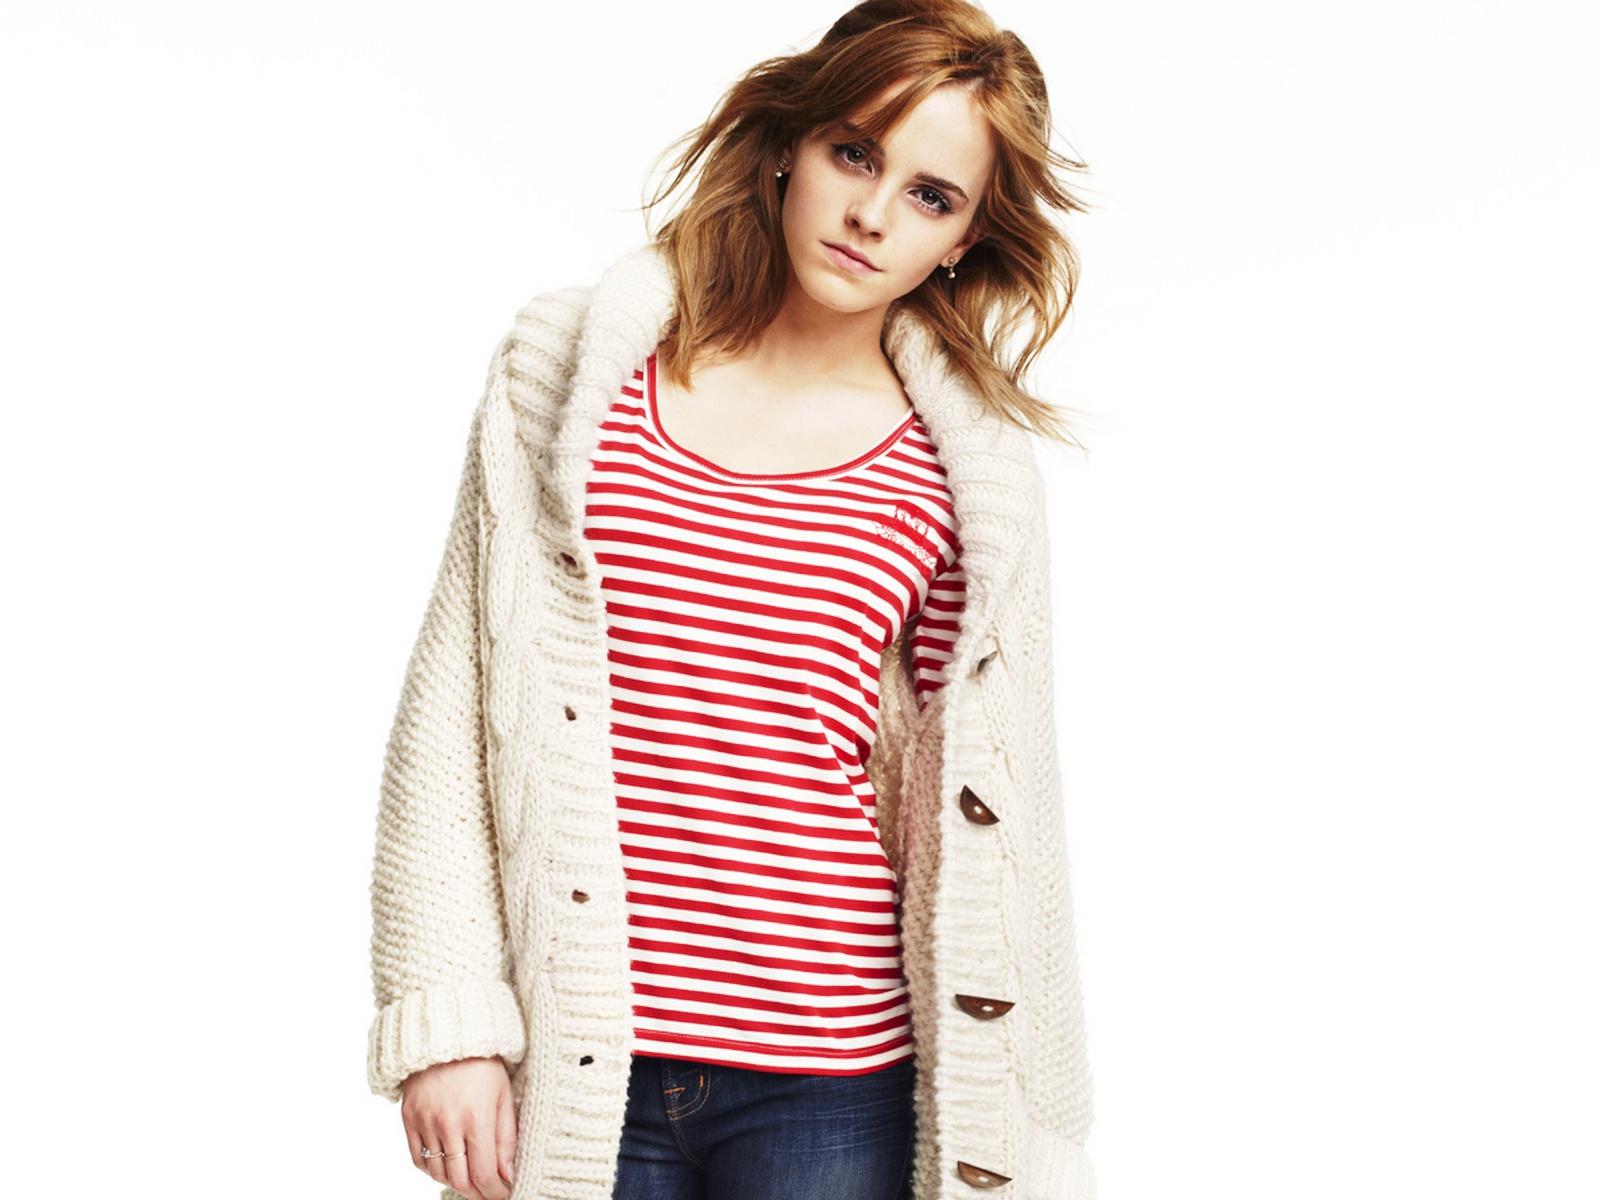 Emma Watson 270 wallpaper